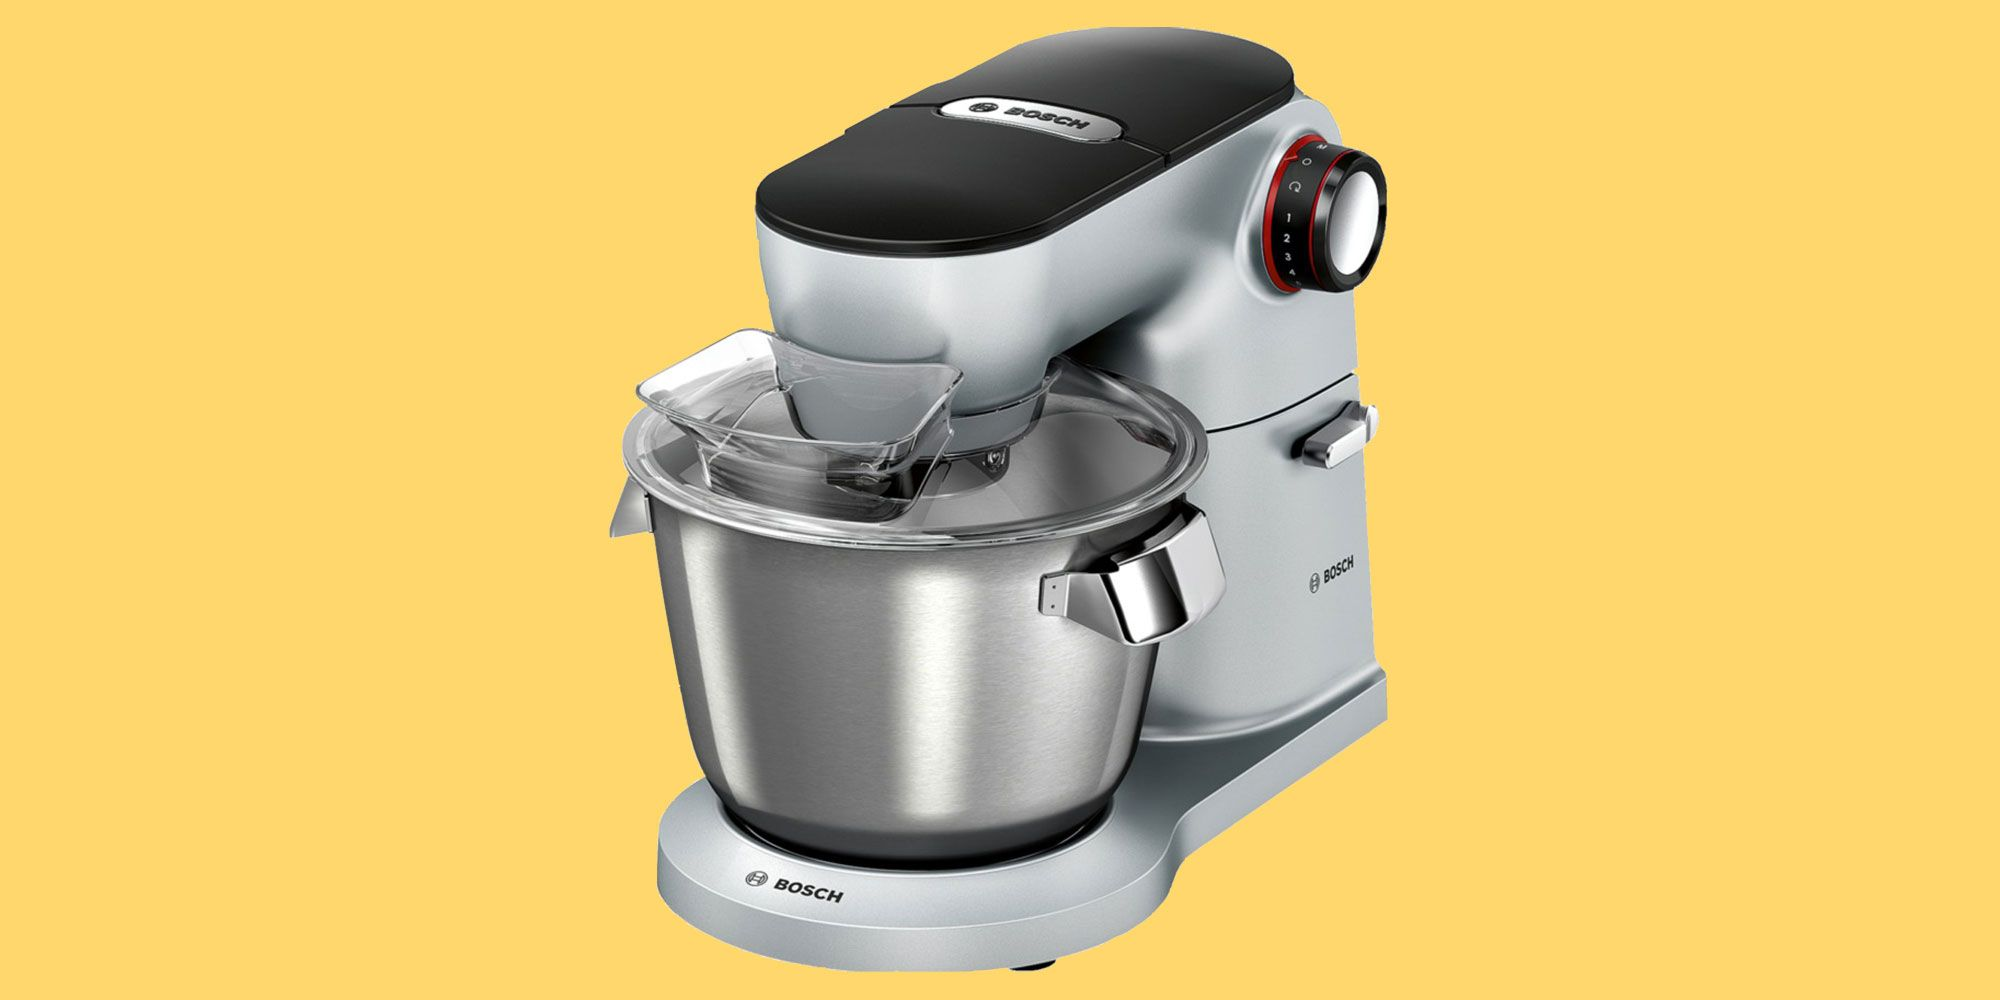 Bosch Optimum Kitchen Machine Mum9g32s00 Review